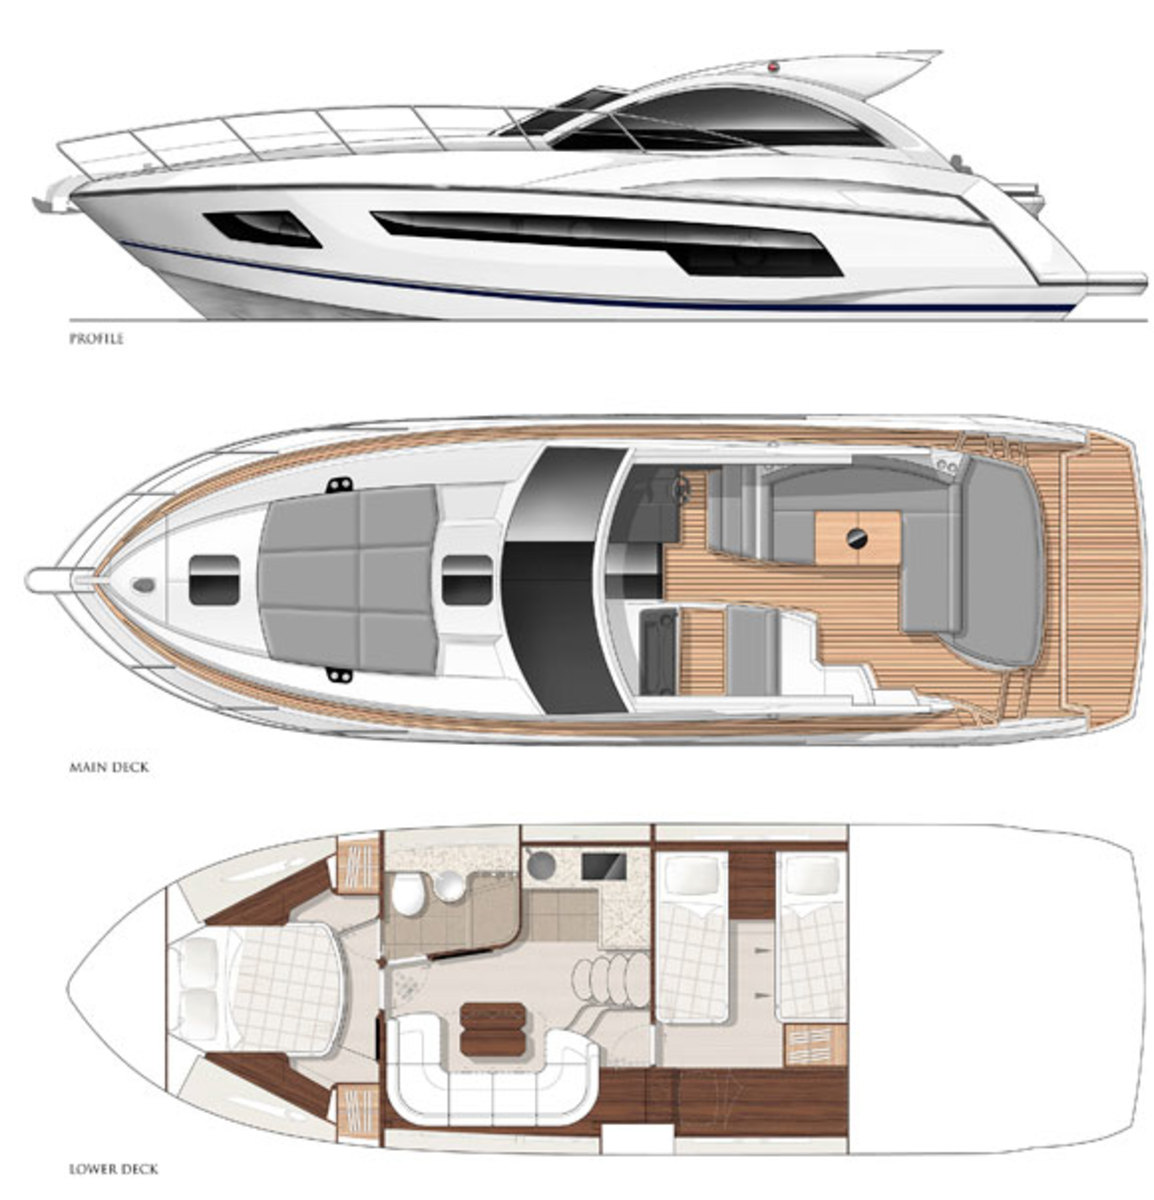 Sunseeker Portofino 40 Profile and layout diagram